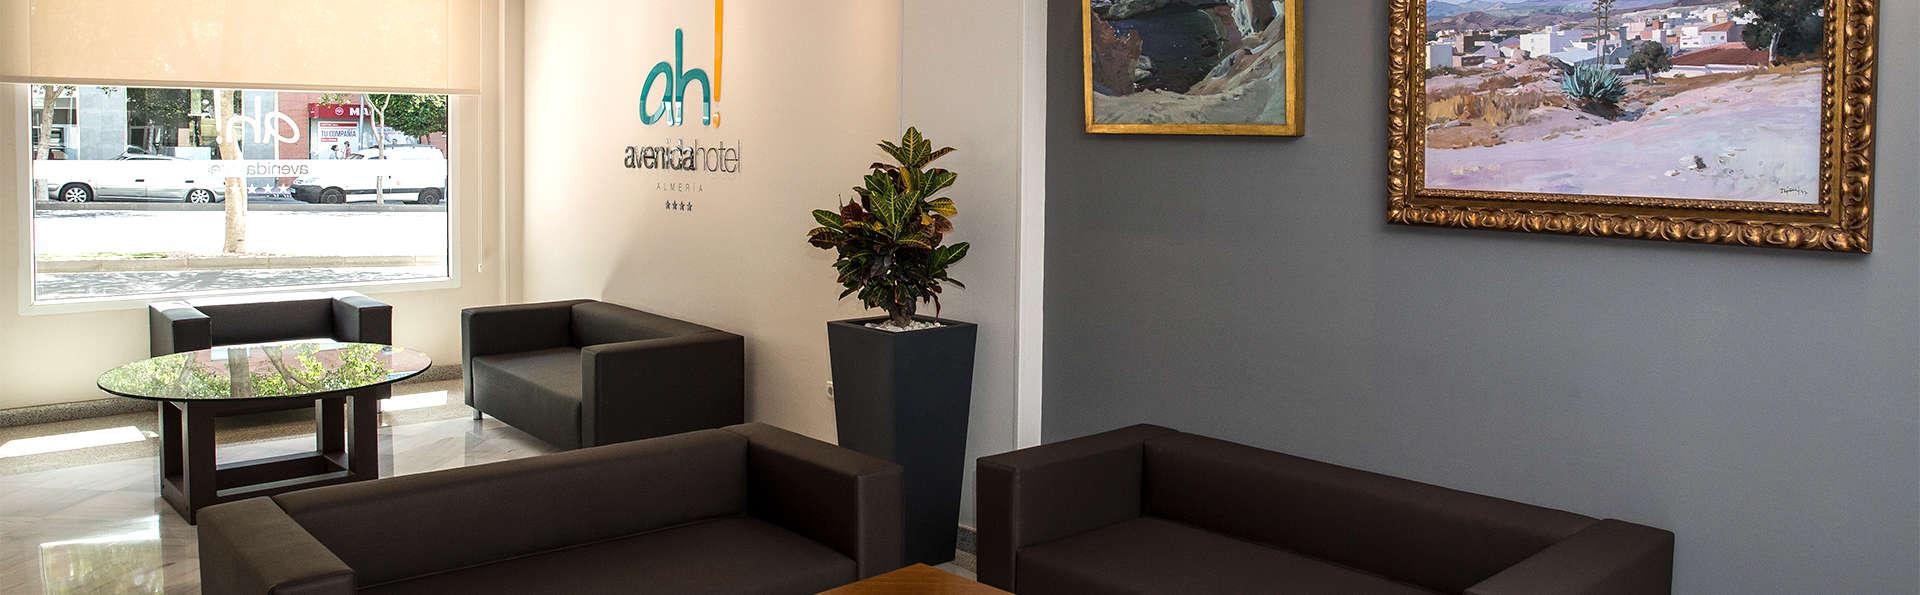 Avenida Hotel Almería - EDIT_Lobby1.jpg